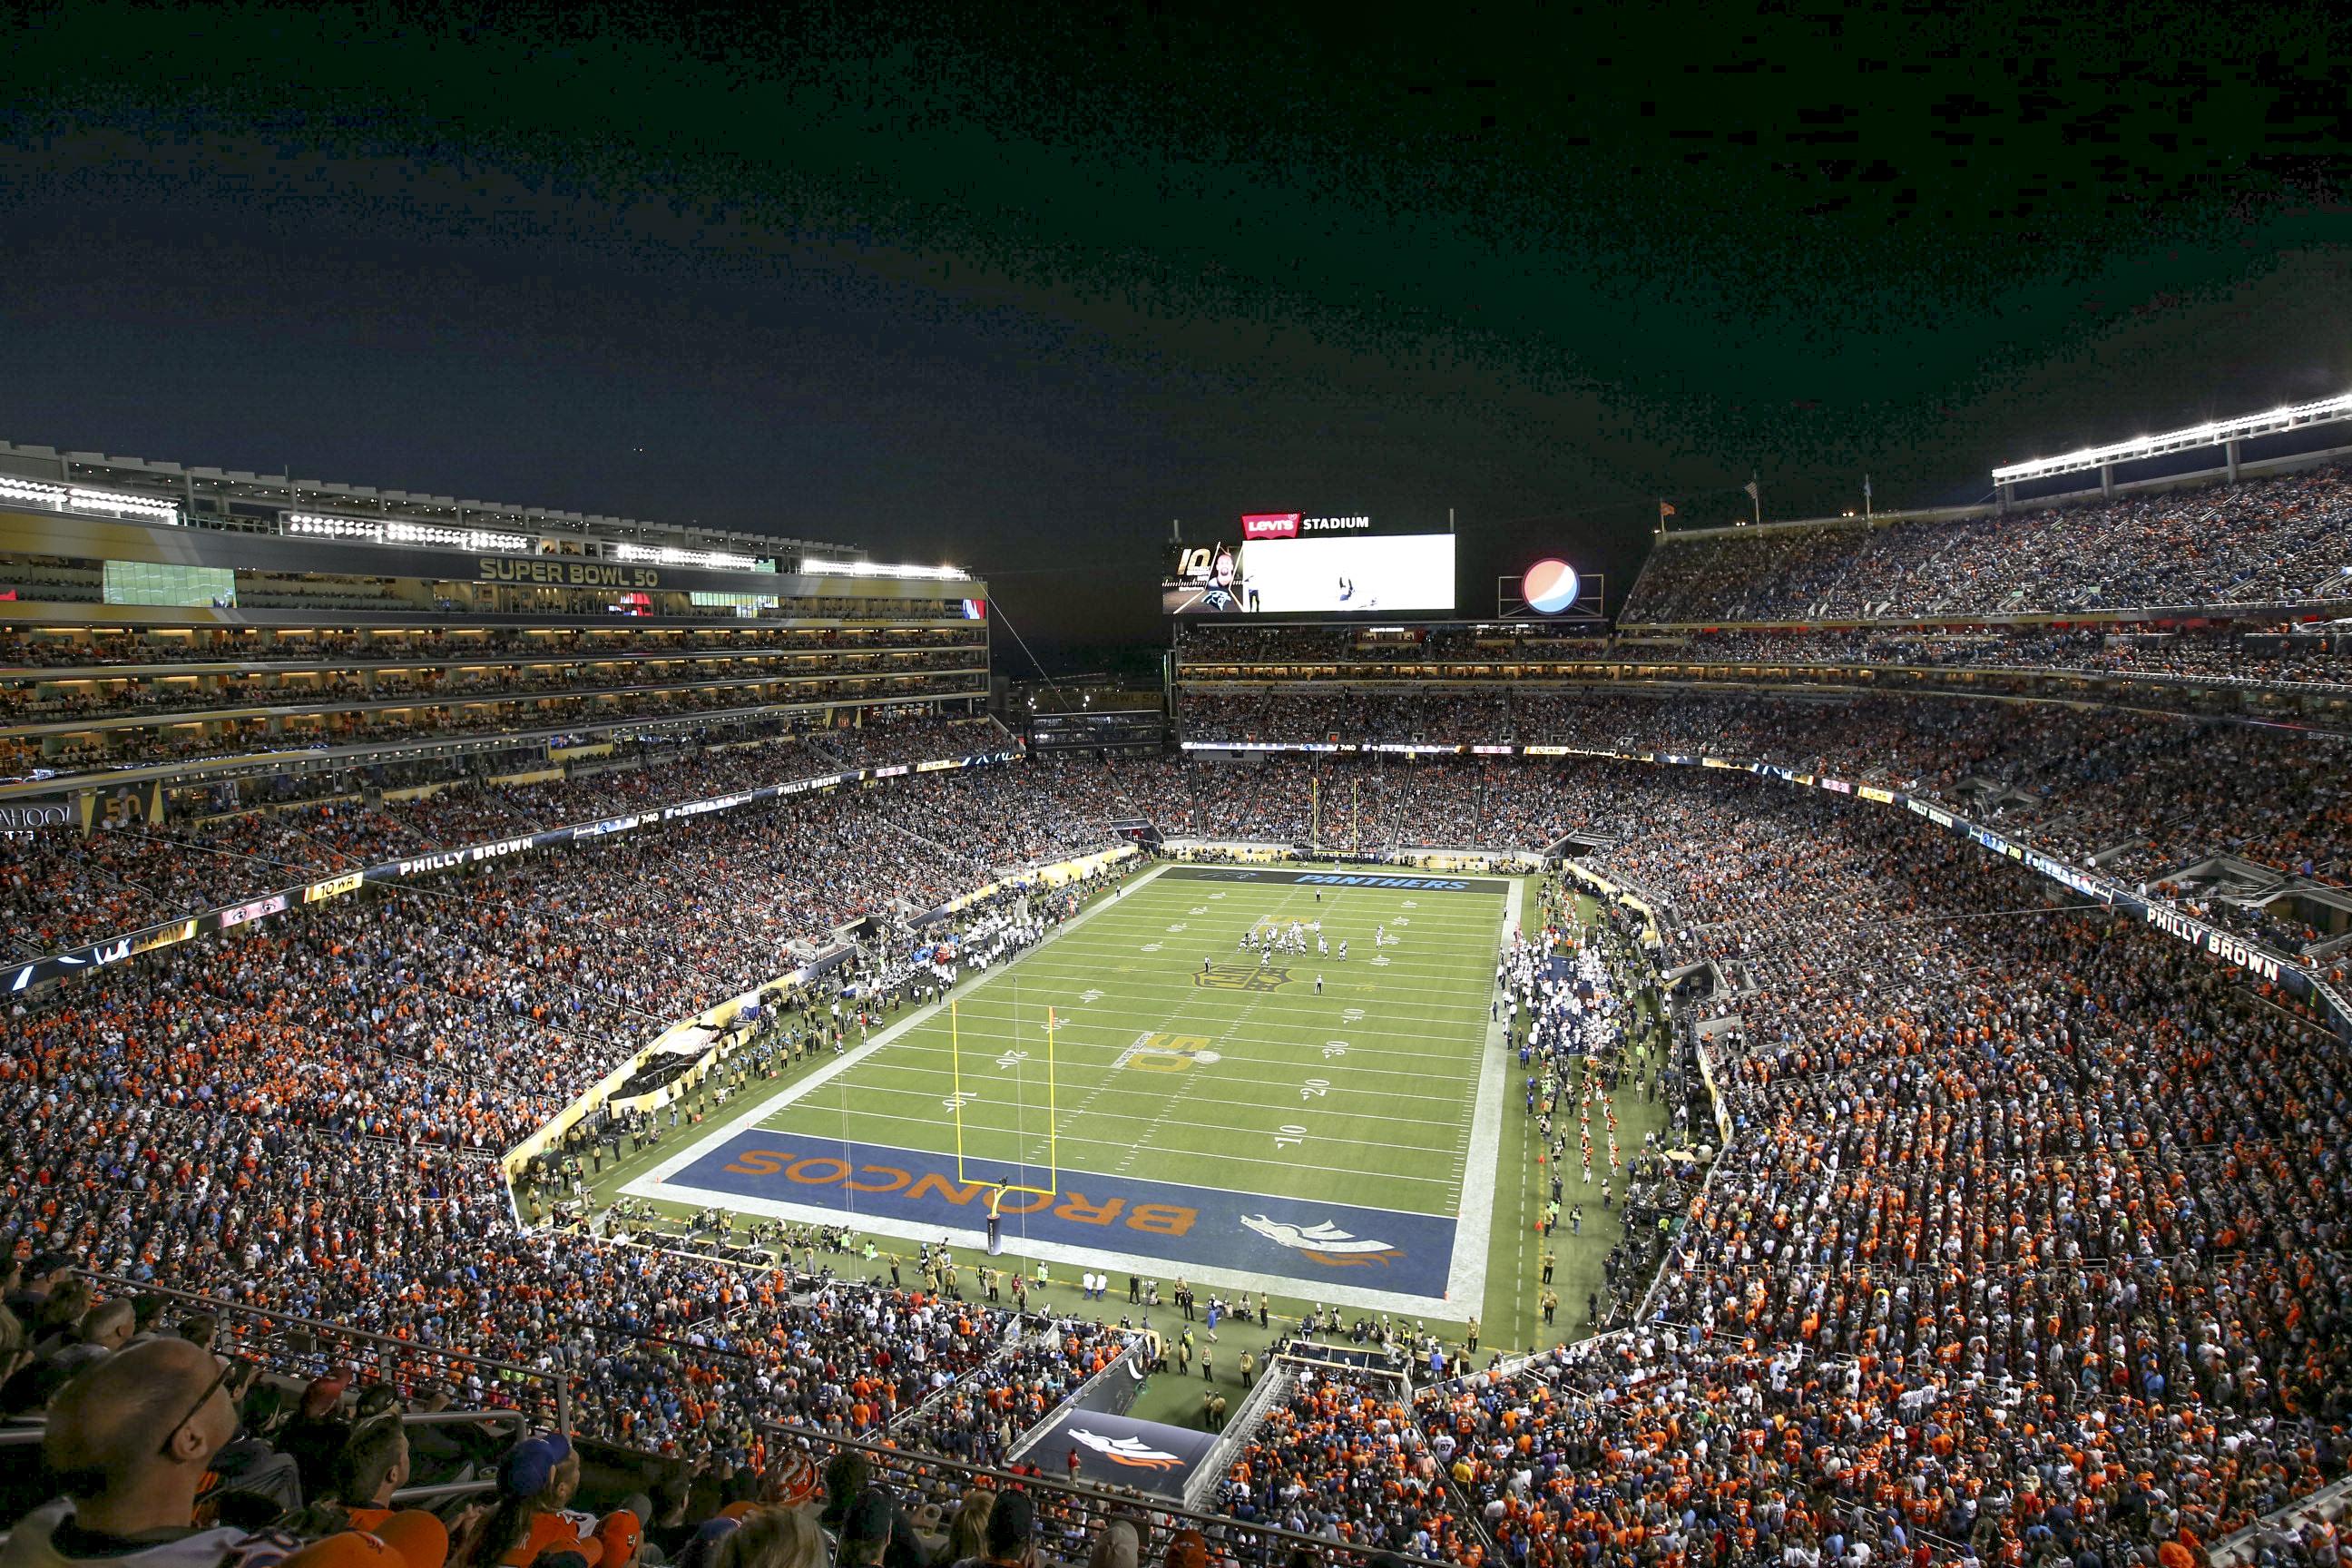 020716-Stadium-nightview